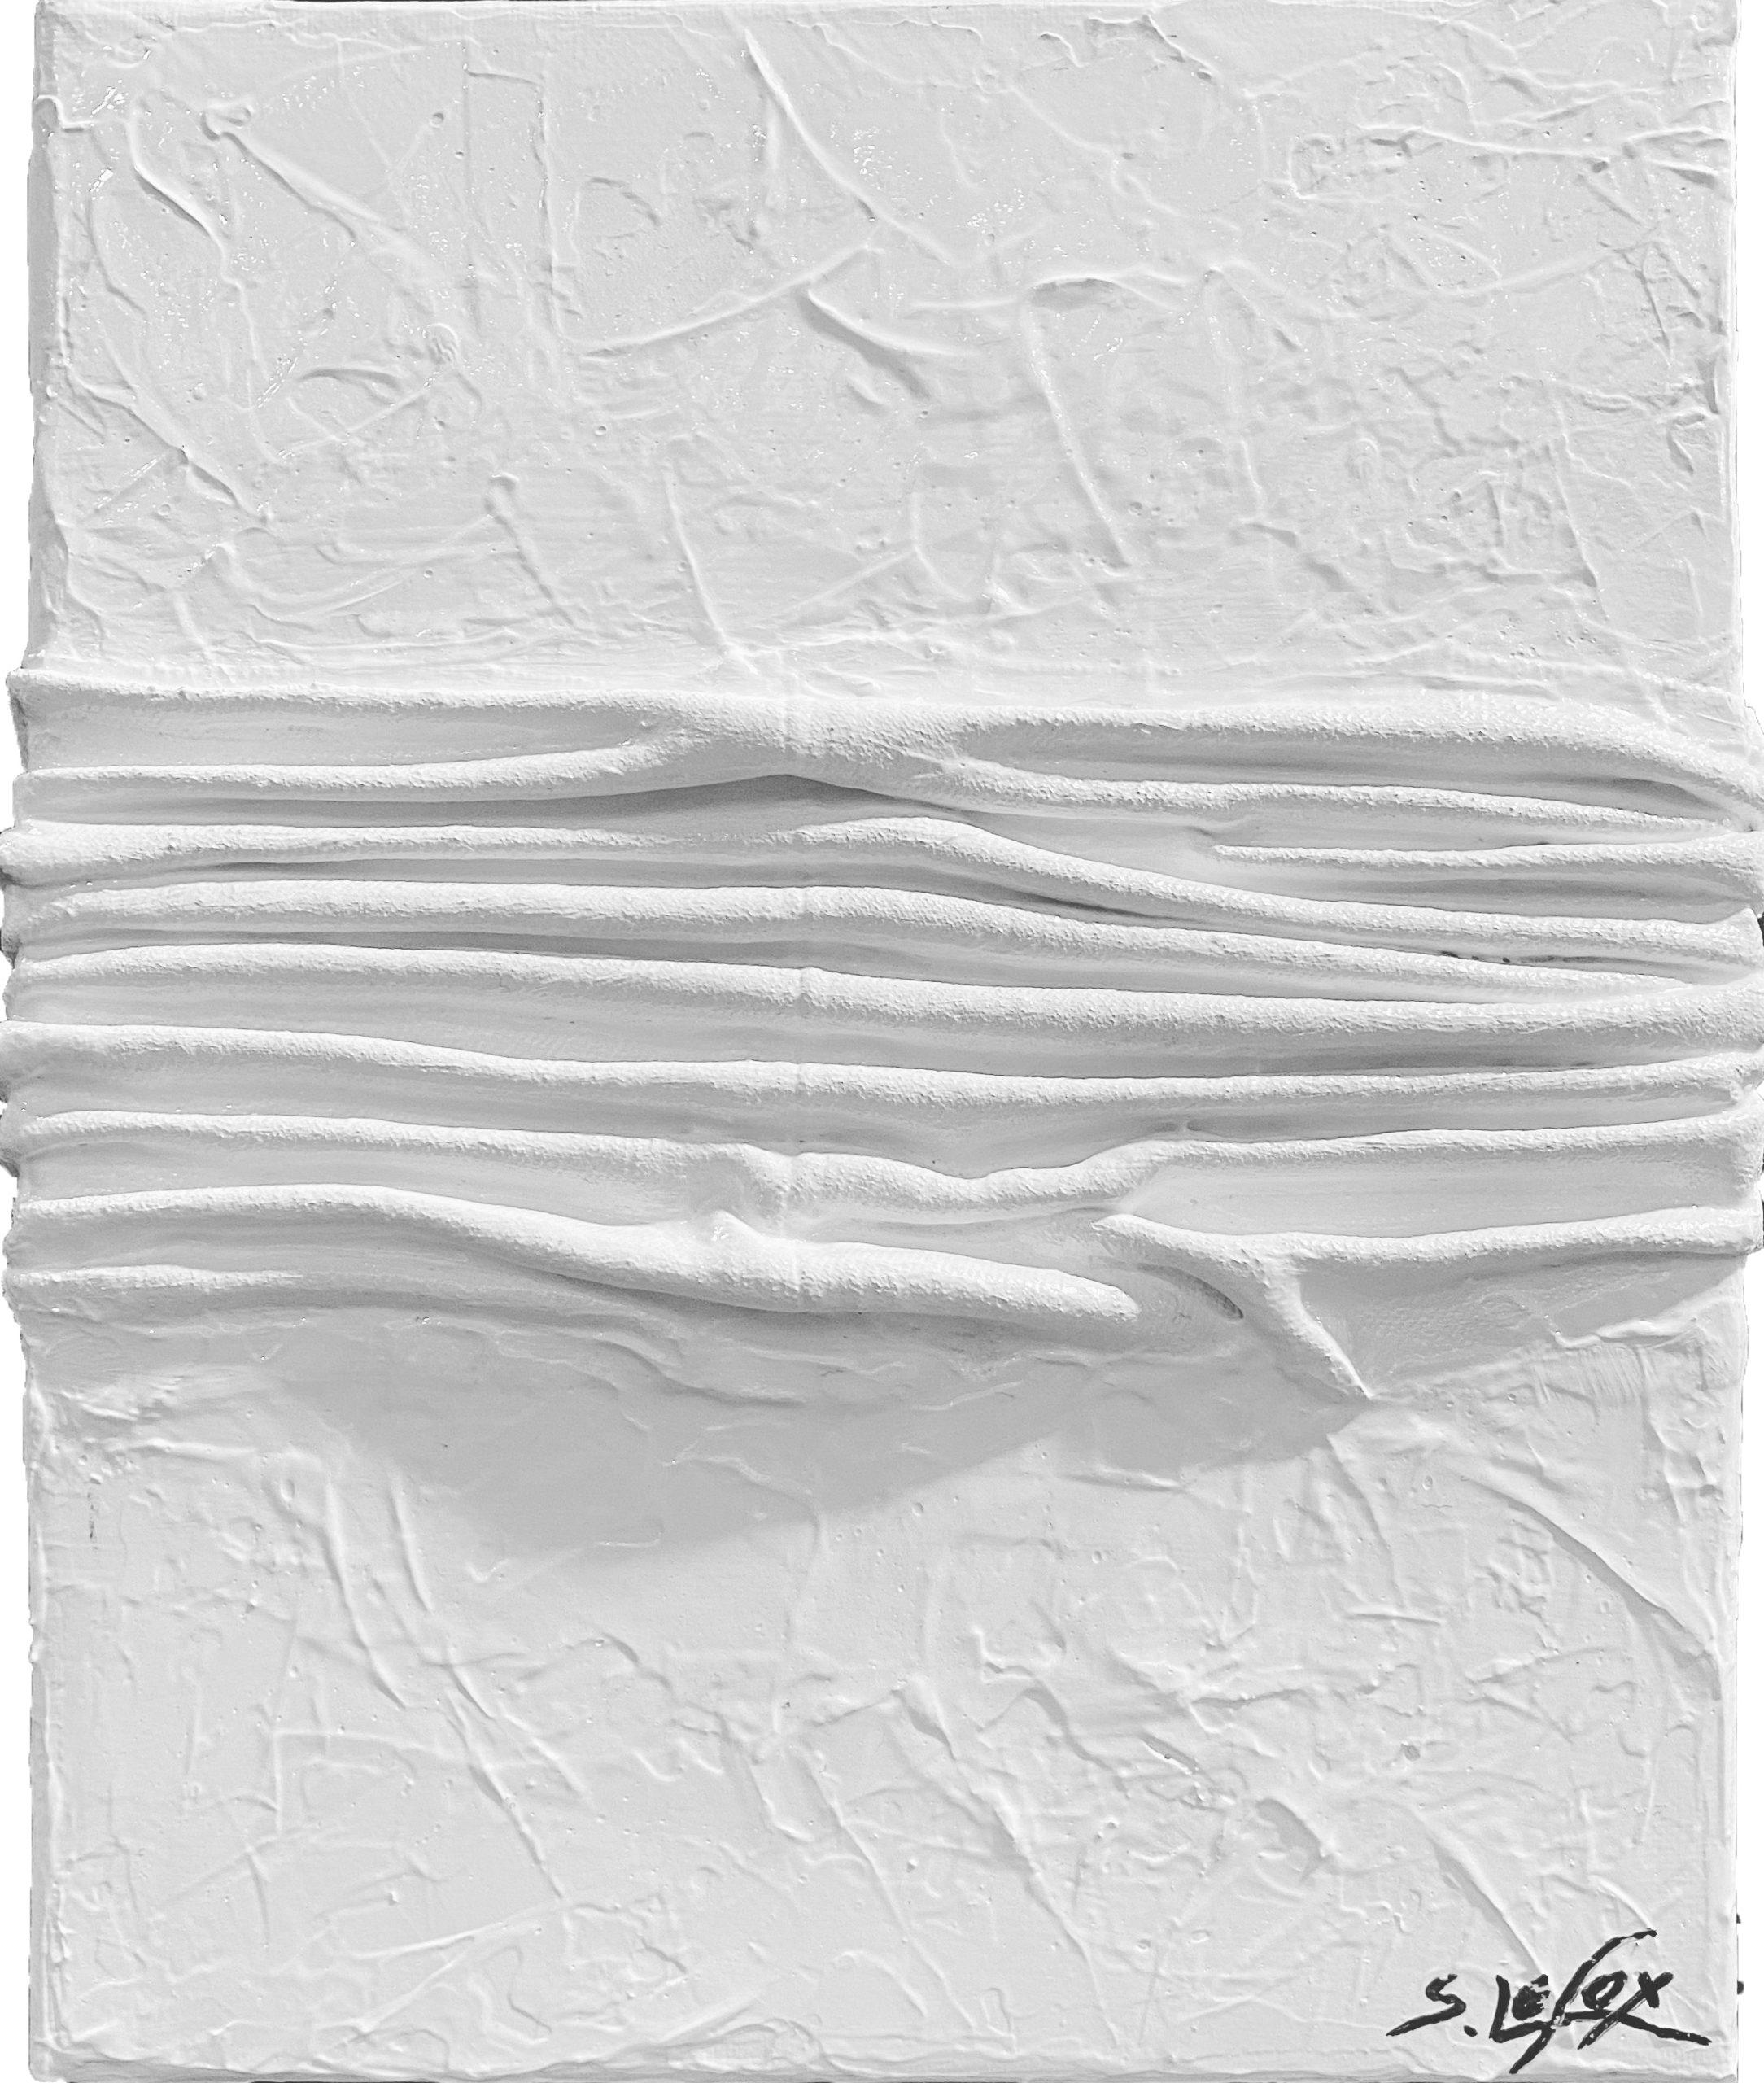 LIMPIDITE CORROMPUE</br> Acrylic on canvas 22 X 27 SBD